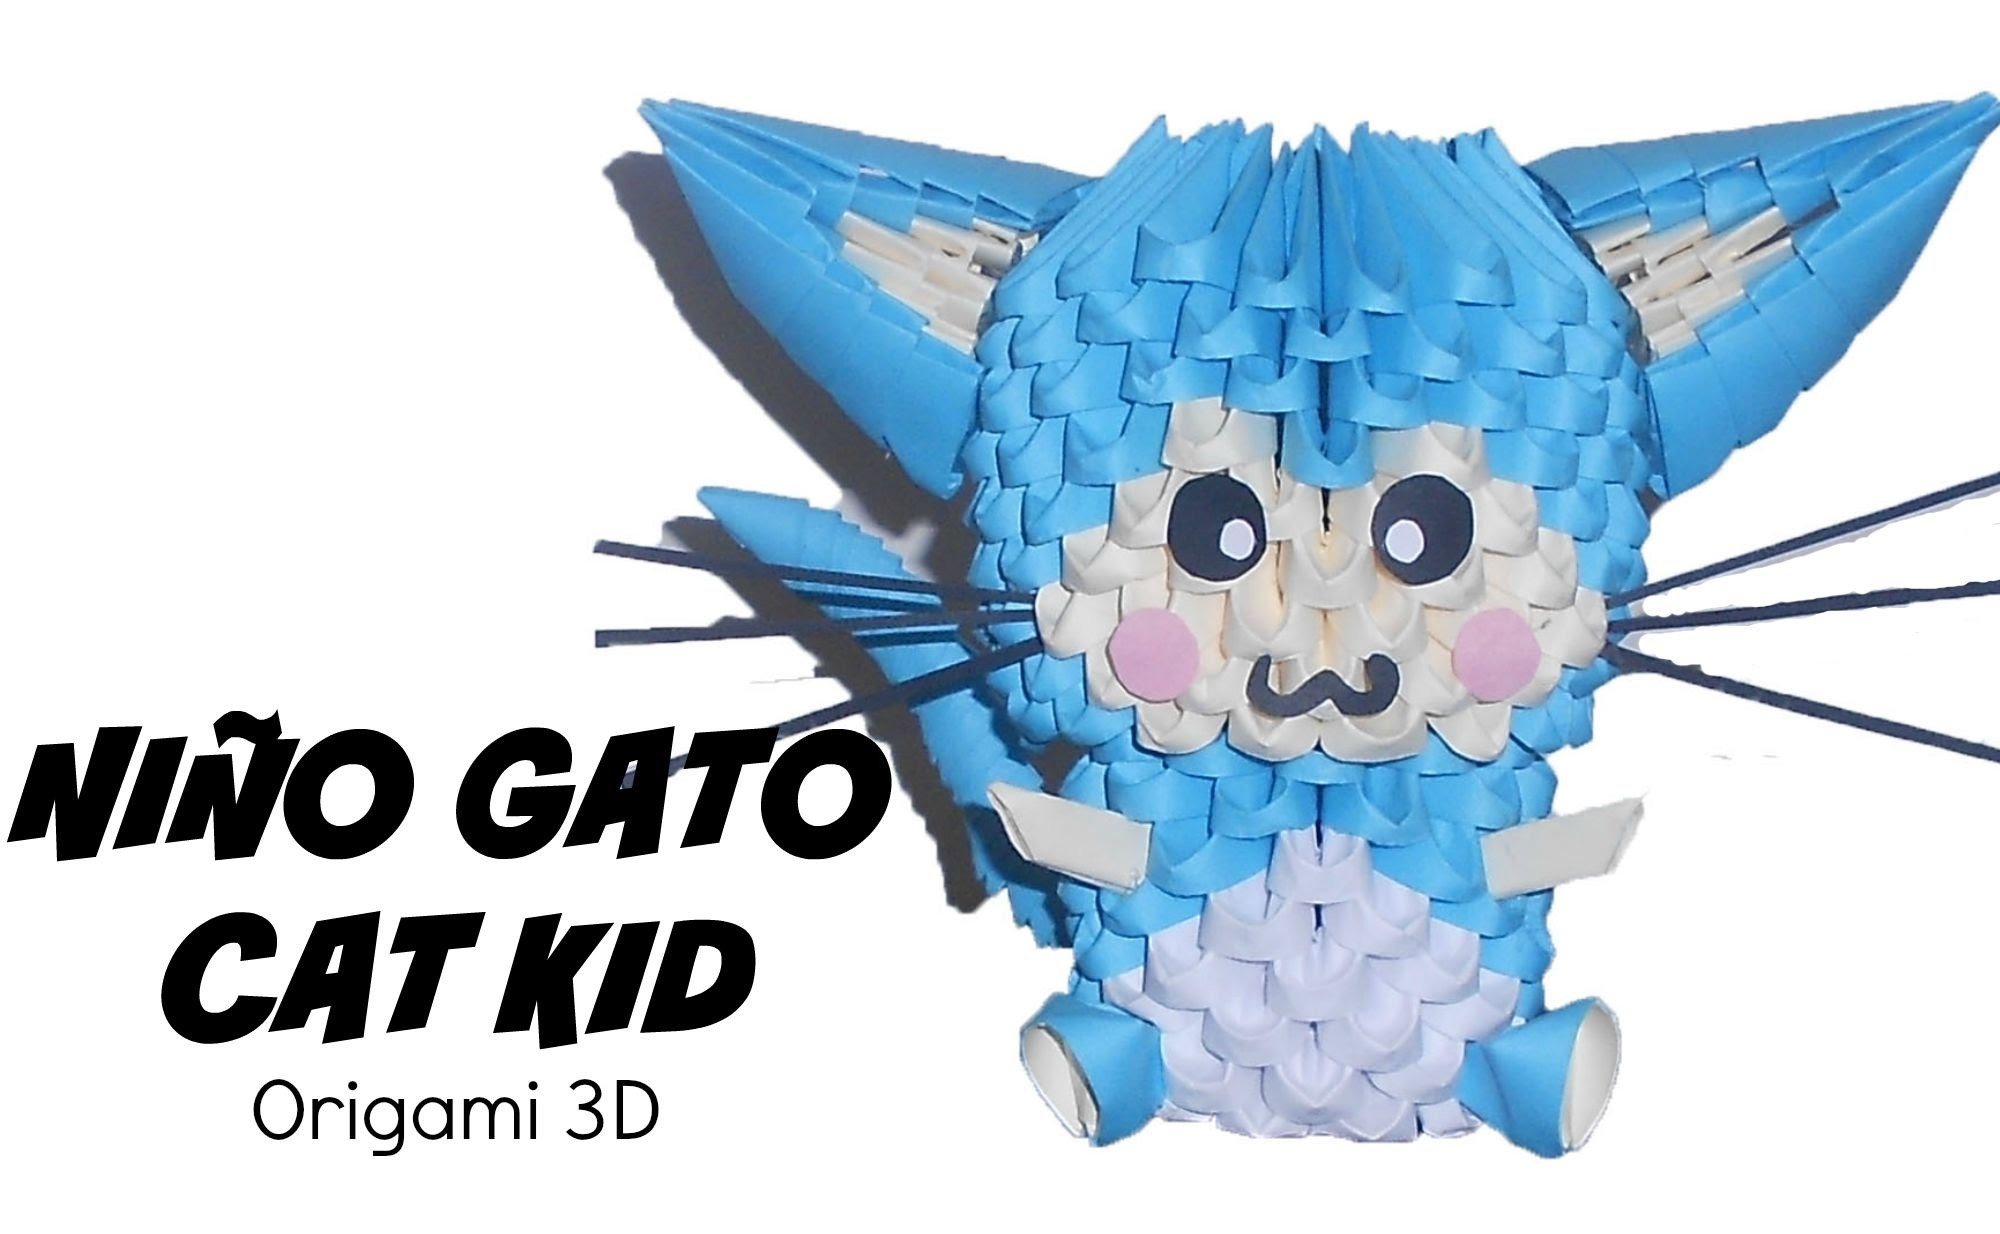 Niño gato - cat kid en origami 3D